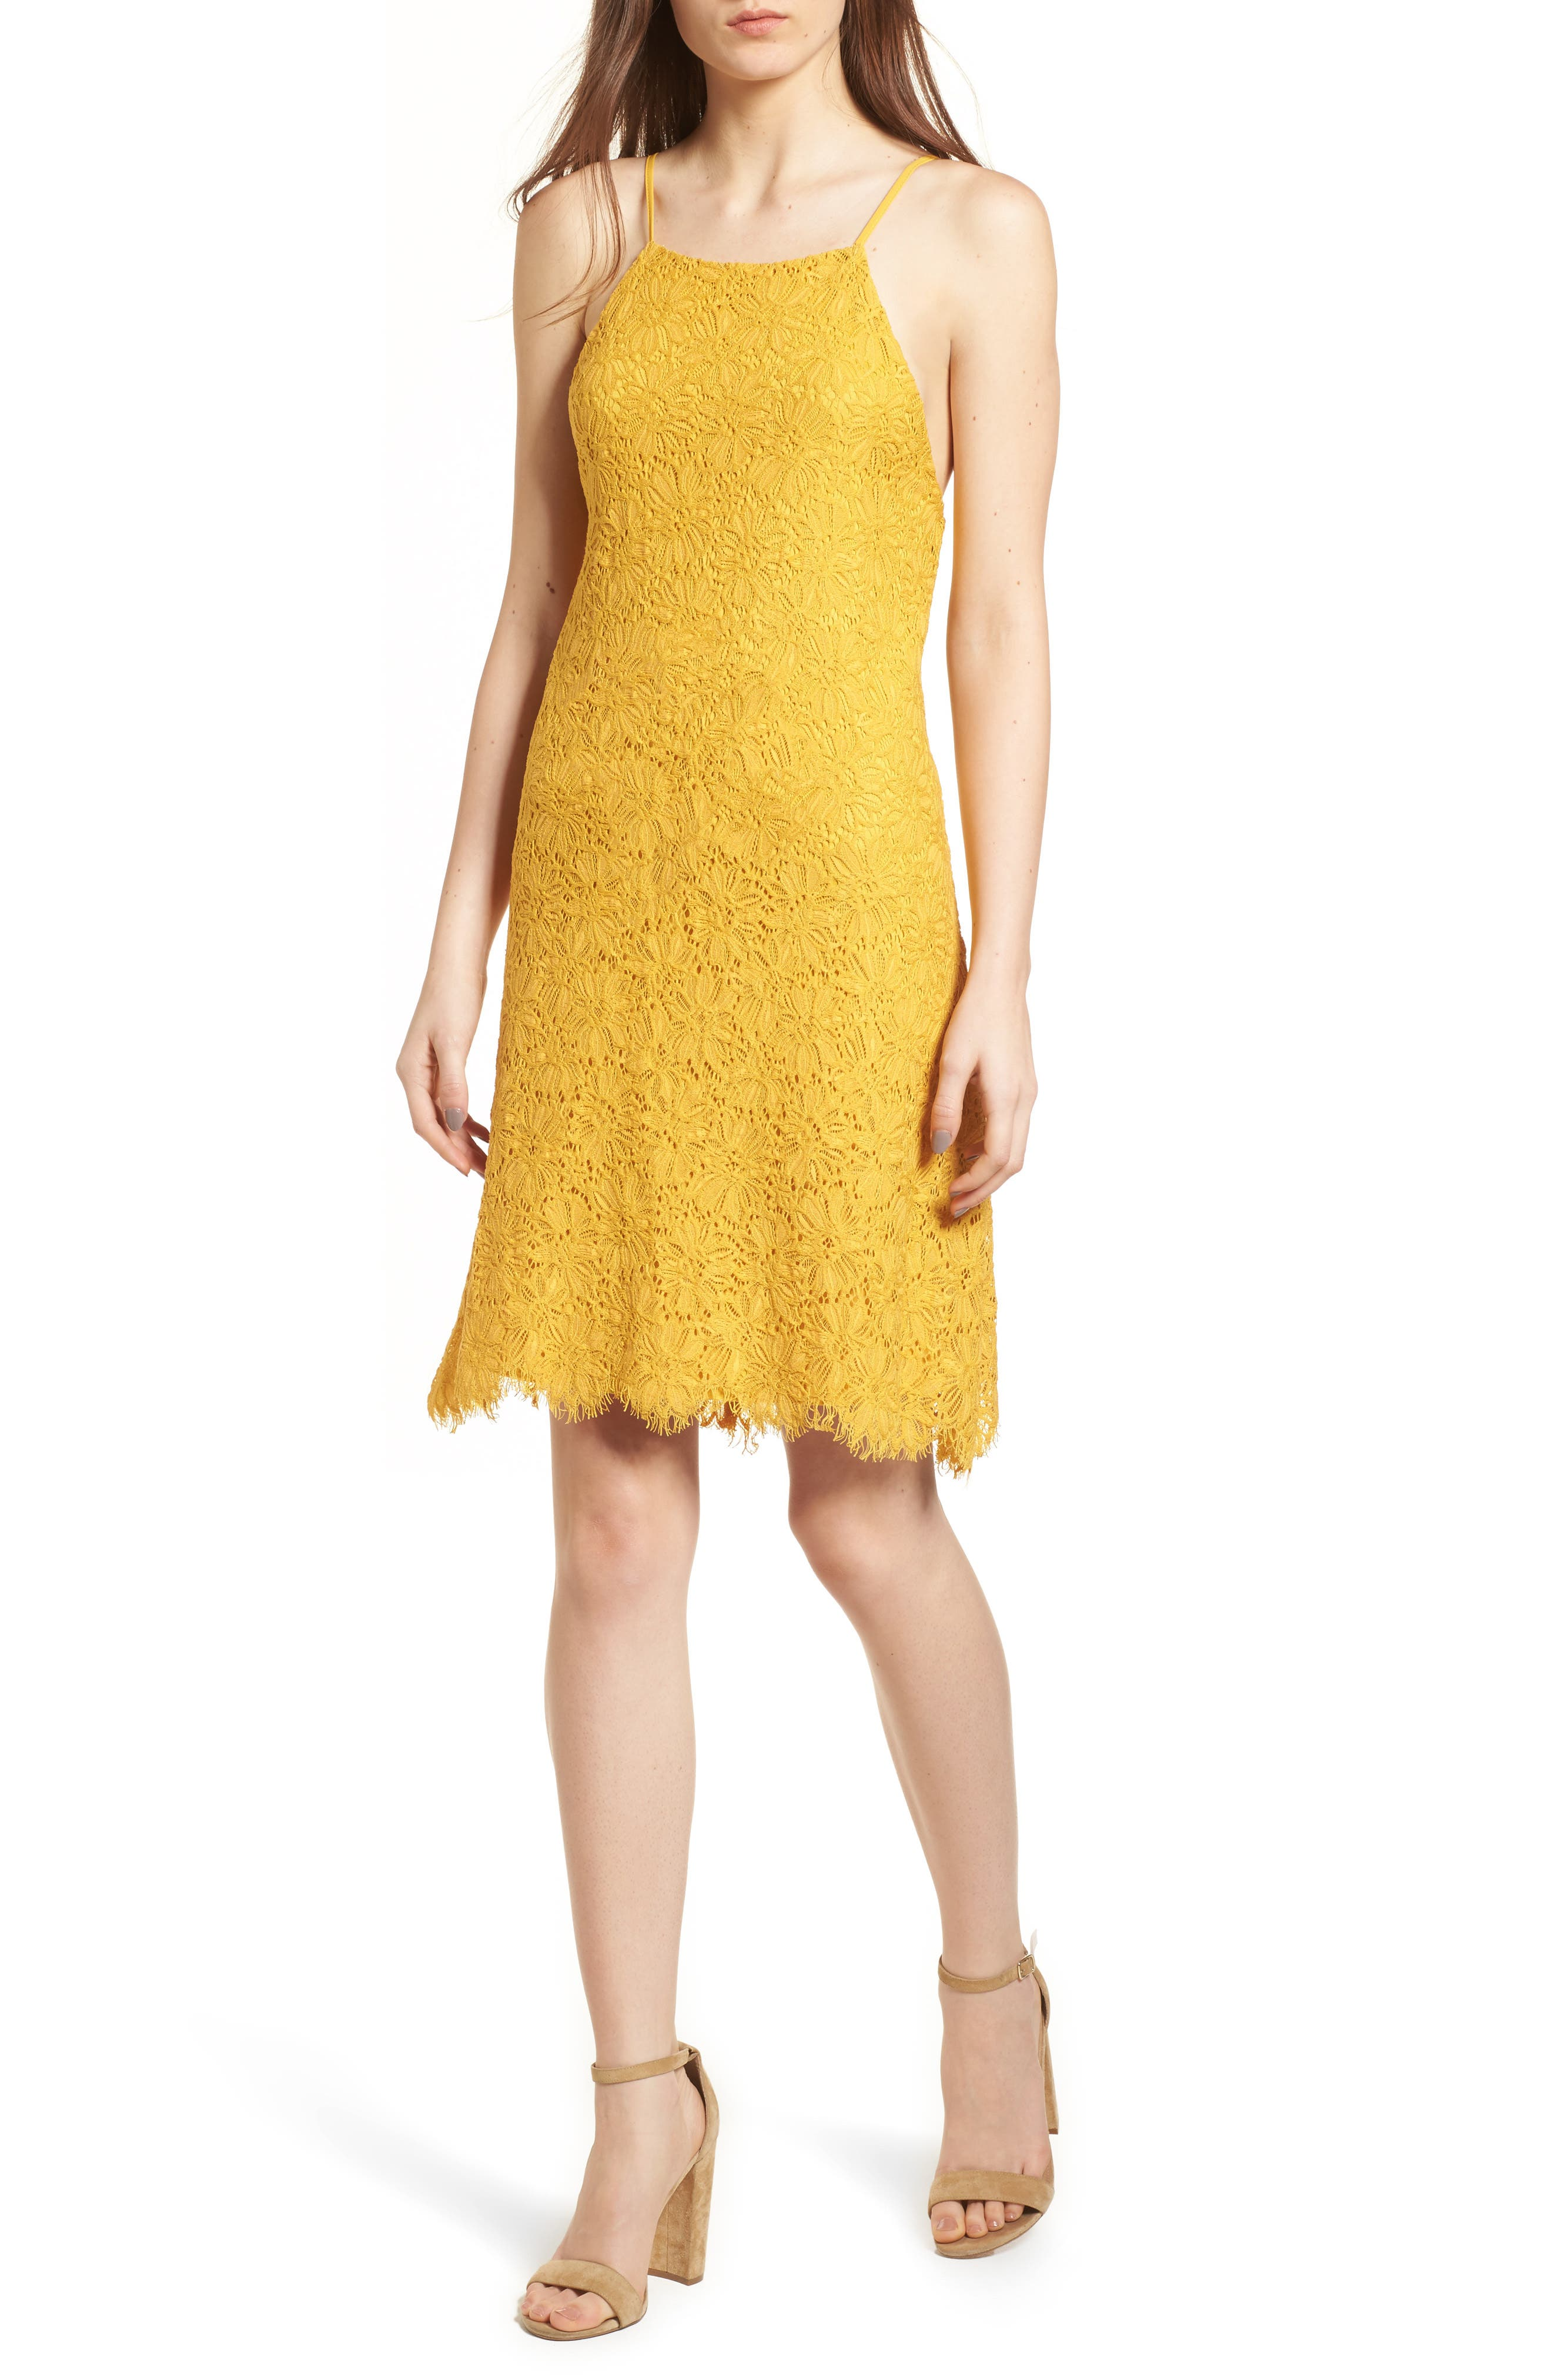 Alternate Image 1 Selected - Speechless Lace Shift Dress